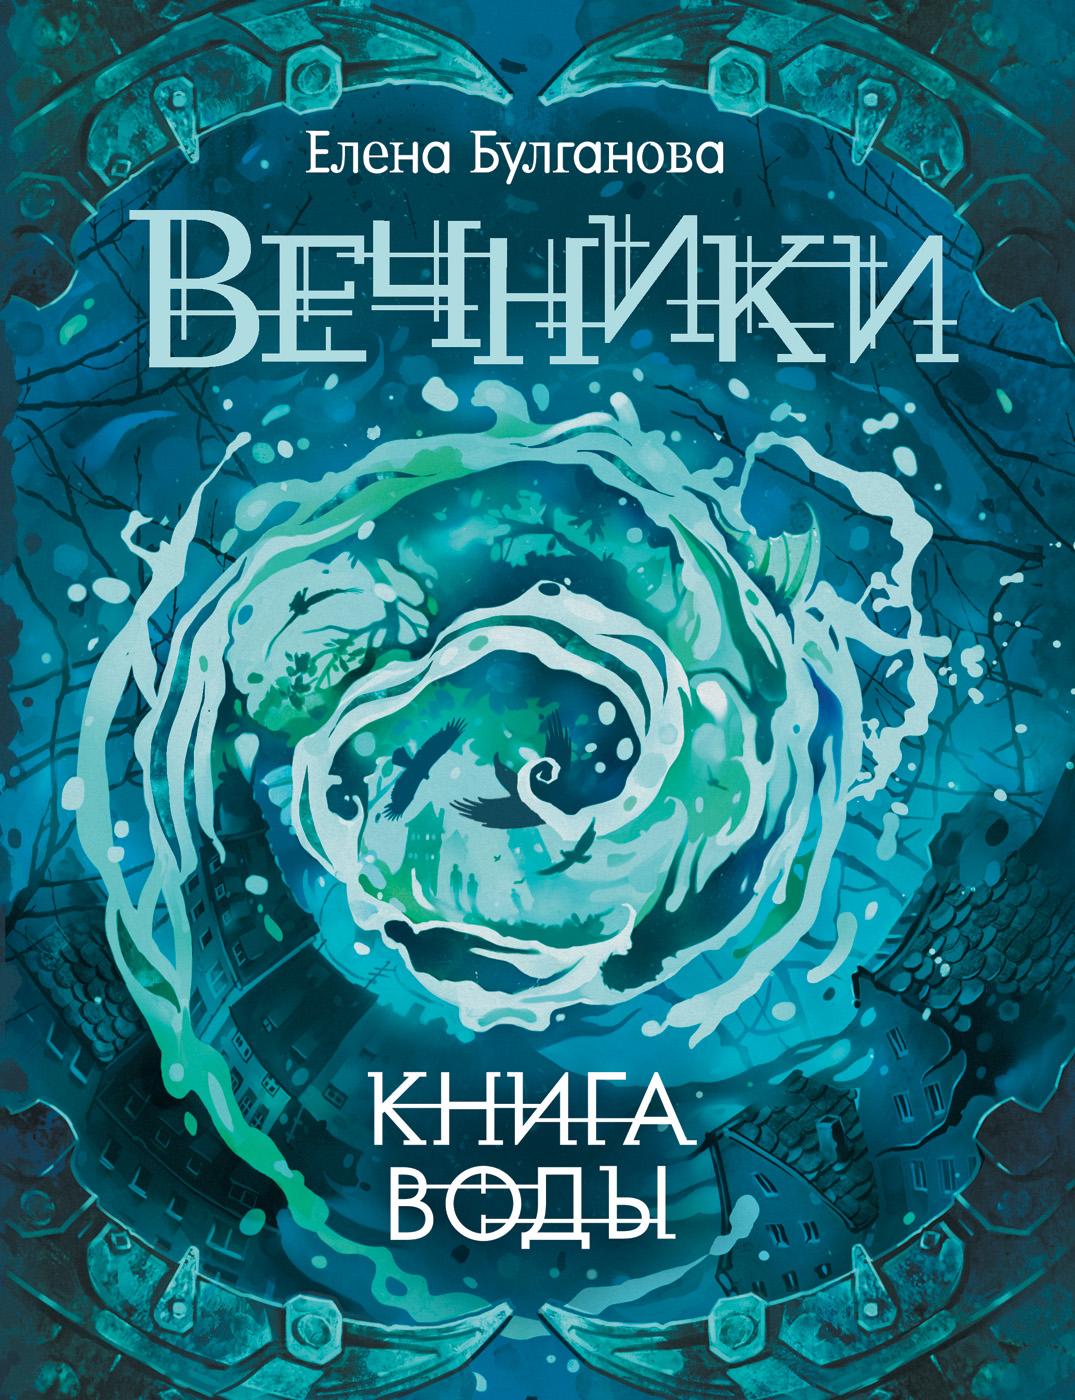 Булганова Е. Вечники. 1. Книга воды цена 2017